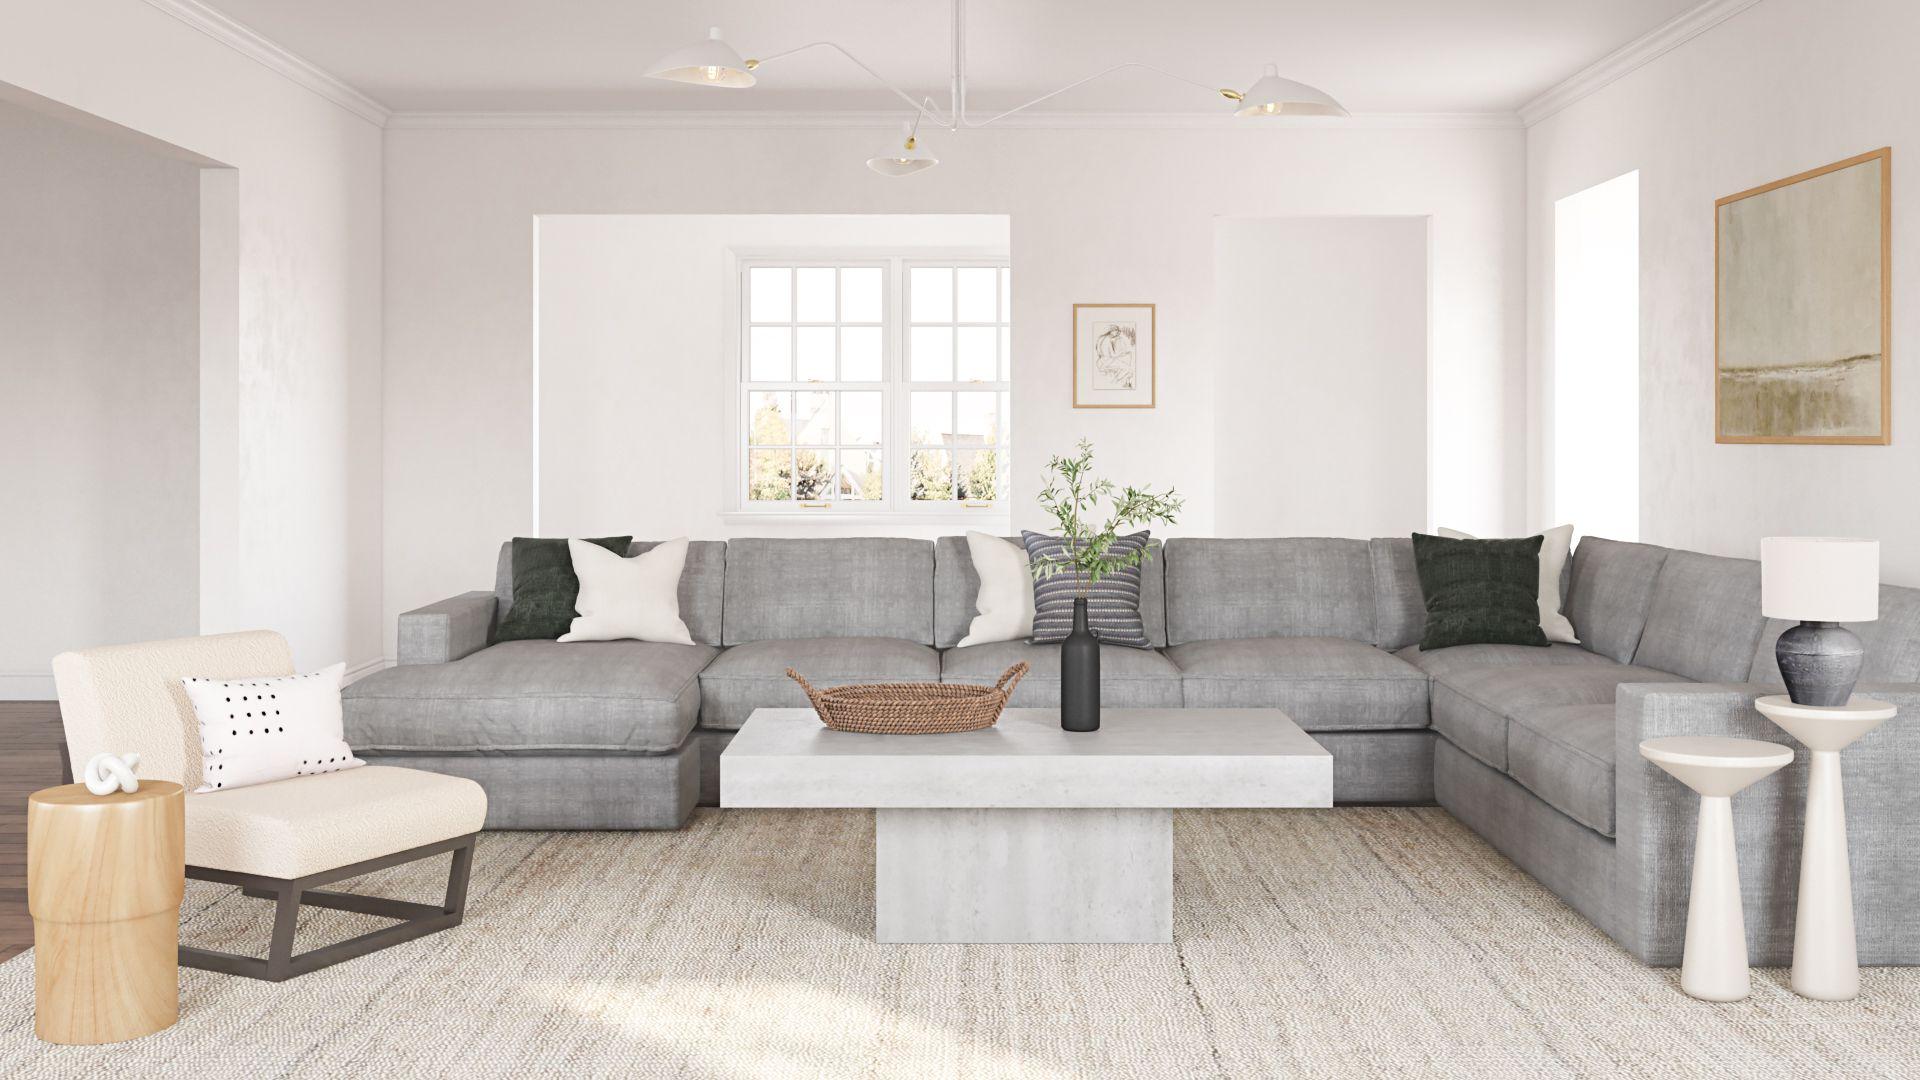 Minimalist Organic Modern Living Room Design Minimal Living Room Modern Sectional Living Room Living Room Designs E design living room